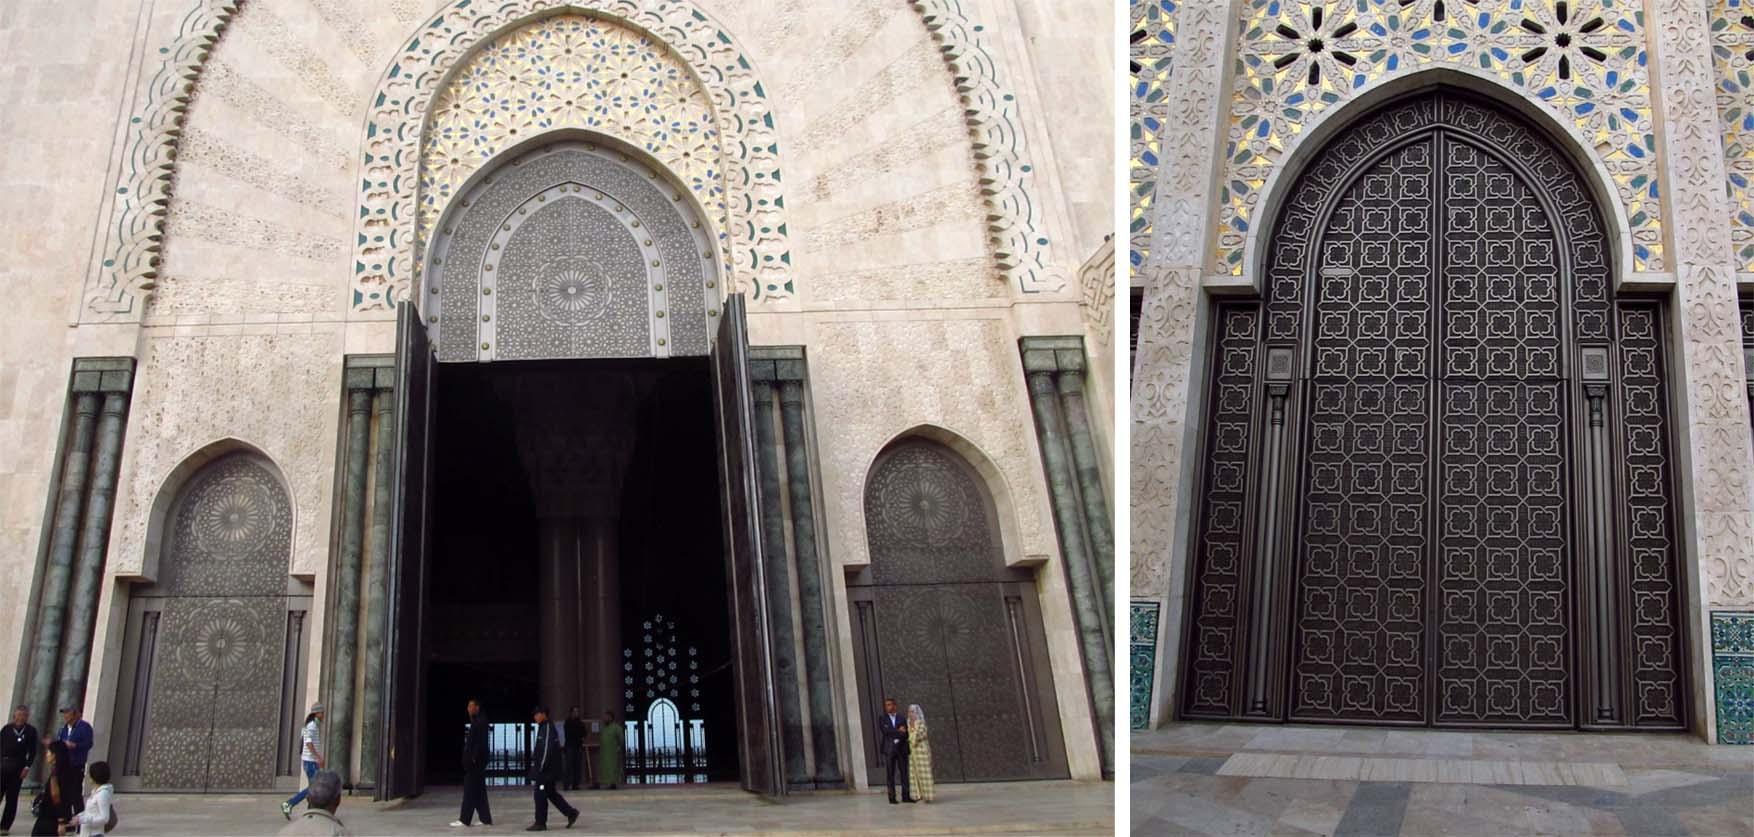 98 maroko kazablanka velika dzamija